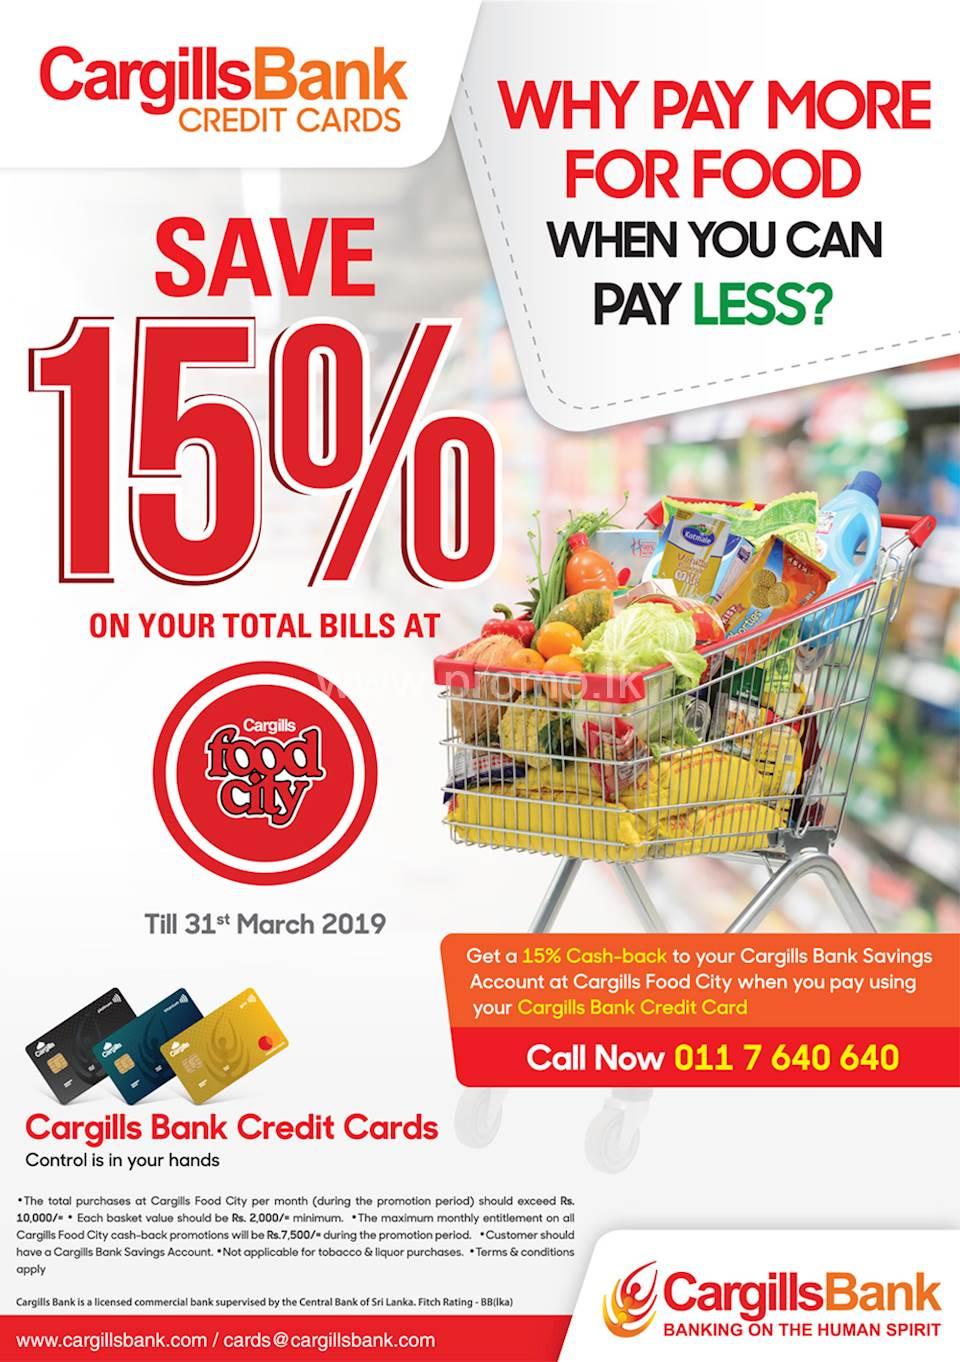 Save 15% on your total bills at Cargills Food City